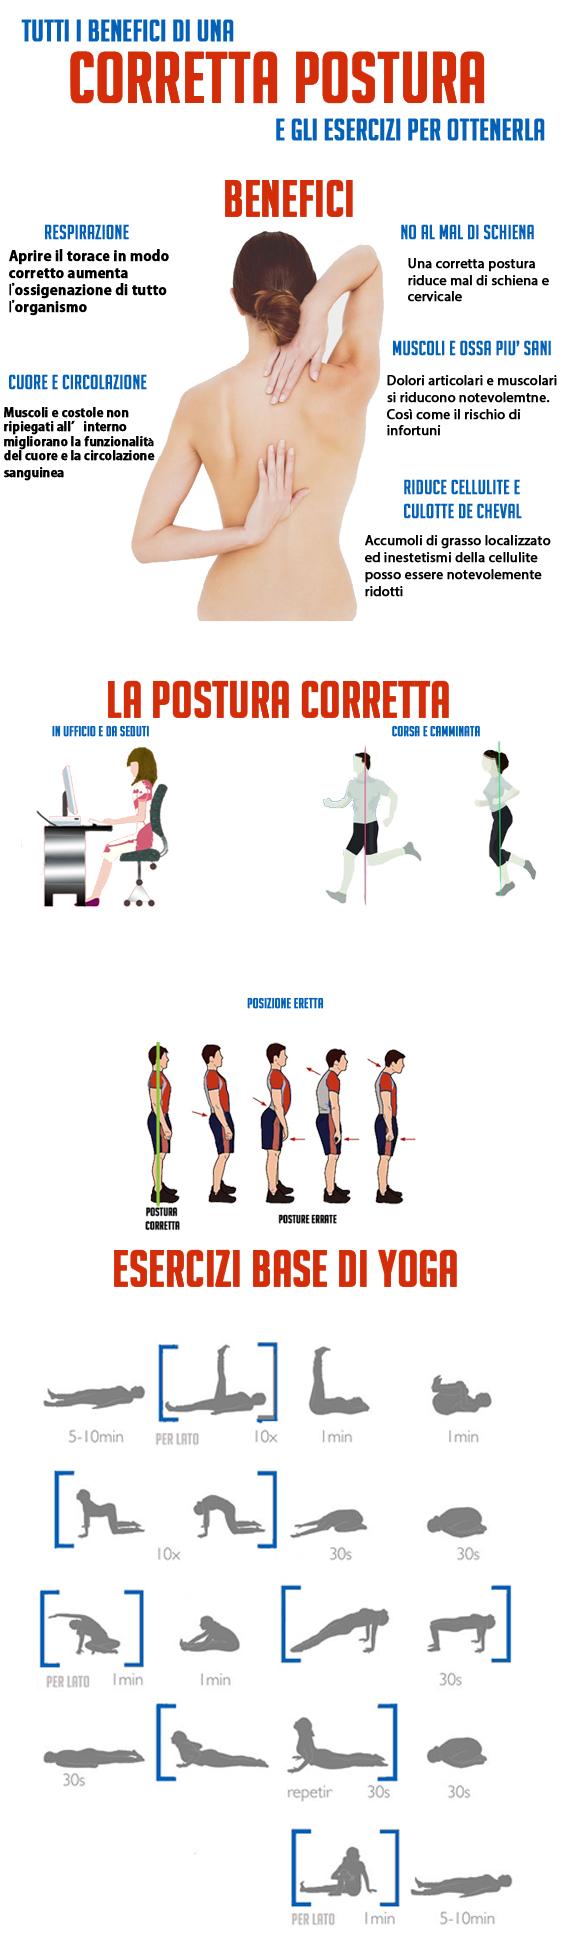 Preferenza POSTURA CORRETTA: TUTTI I BENEFICI - Workout-Italia KT18